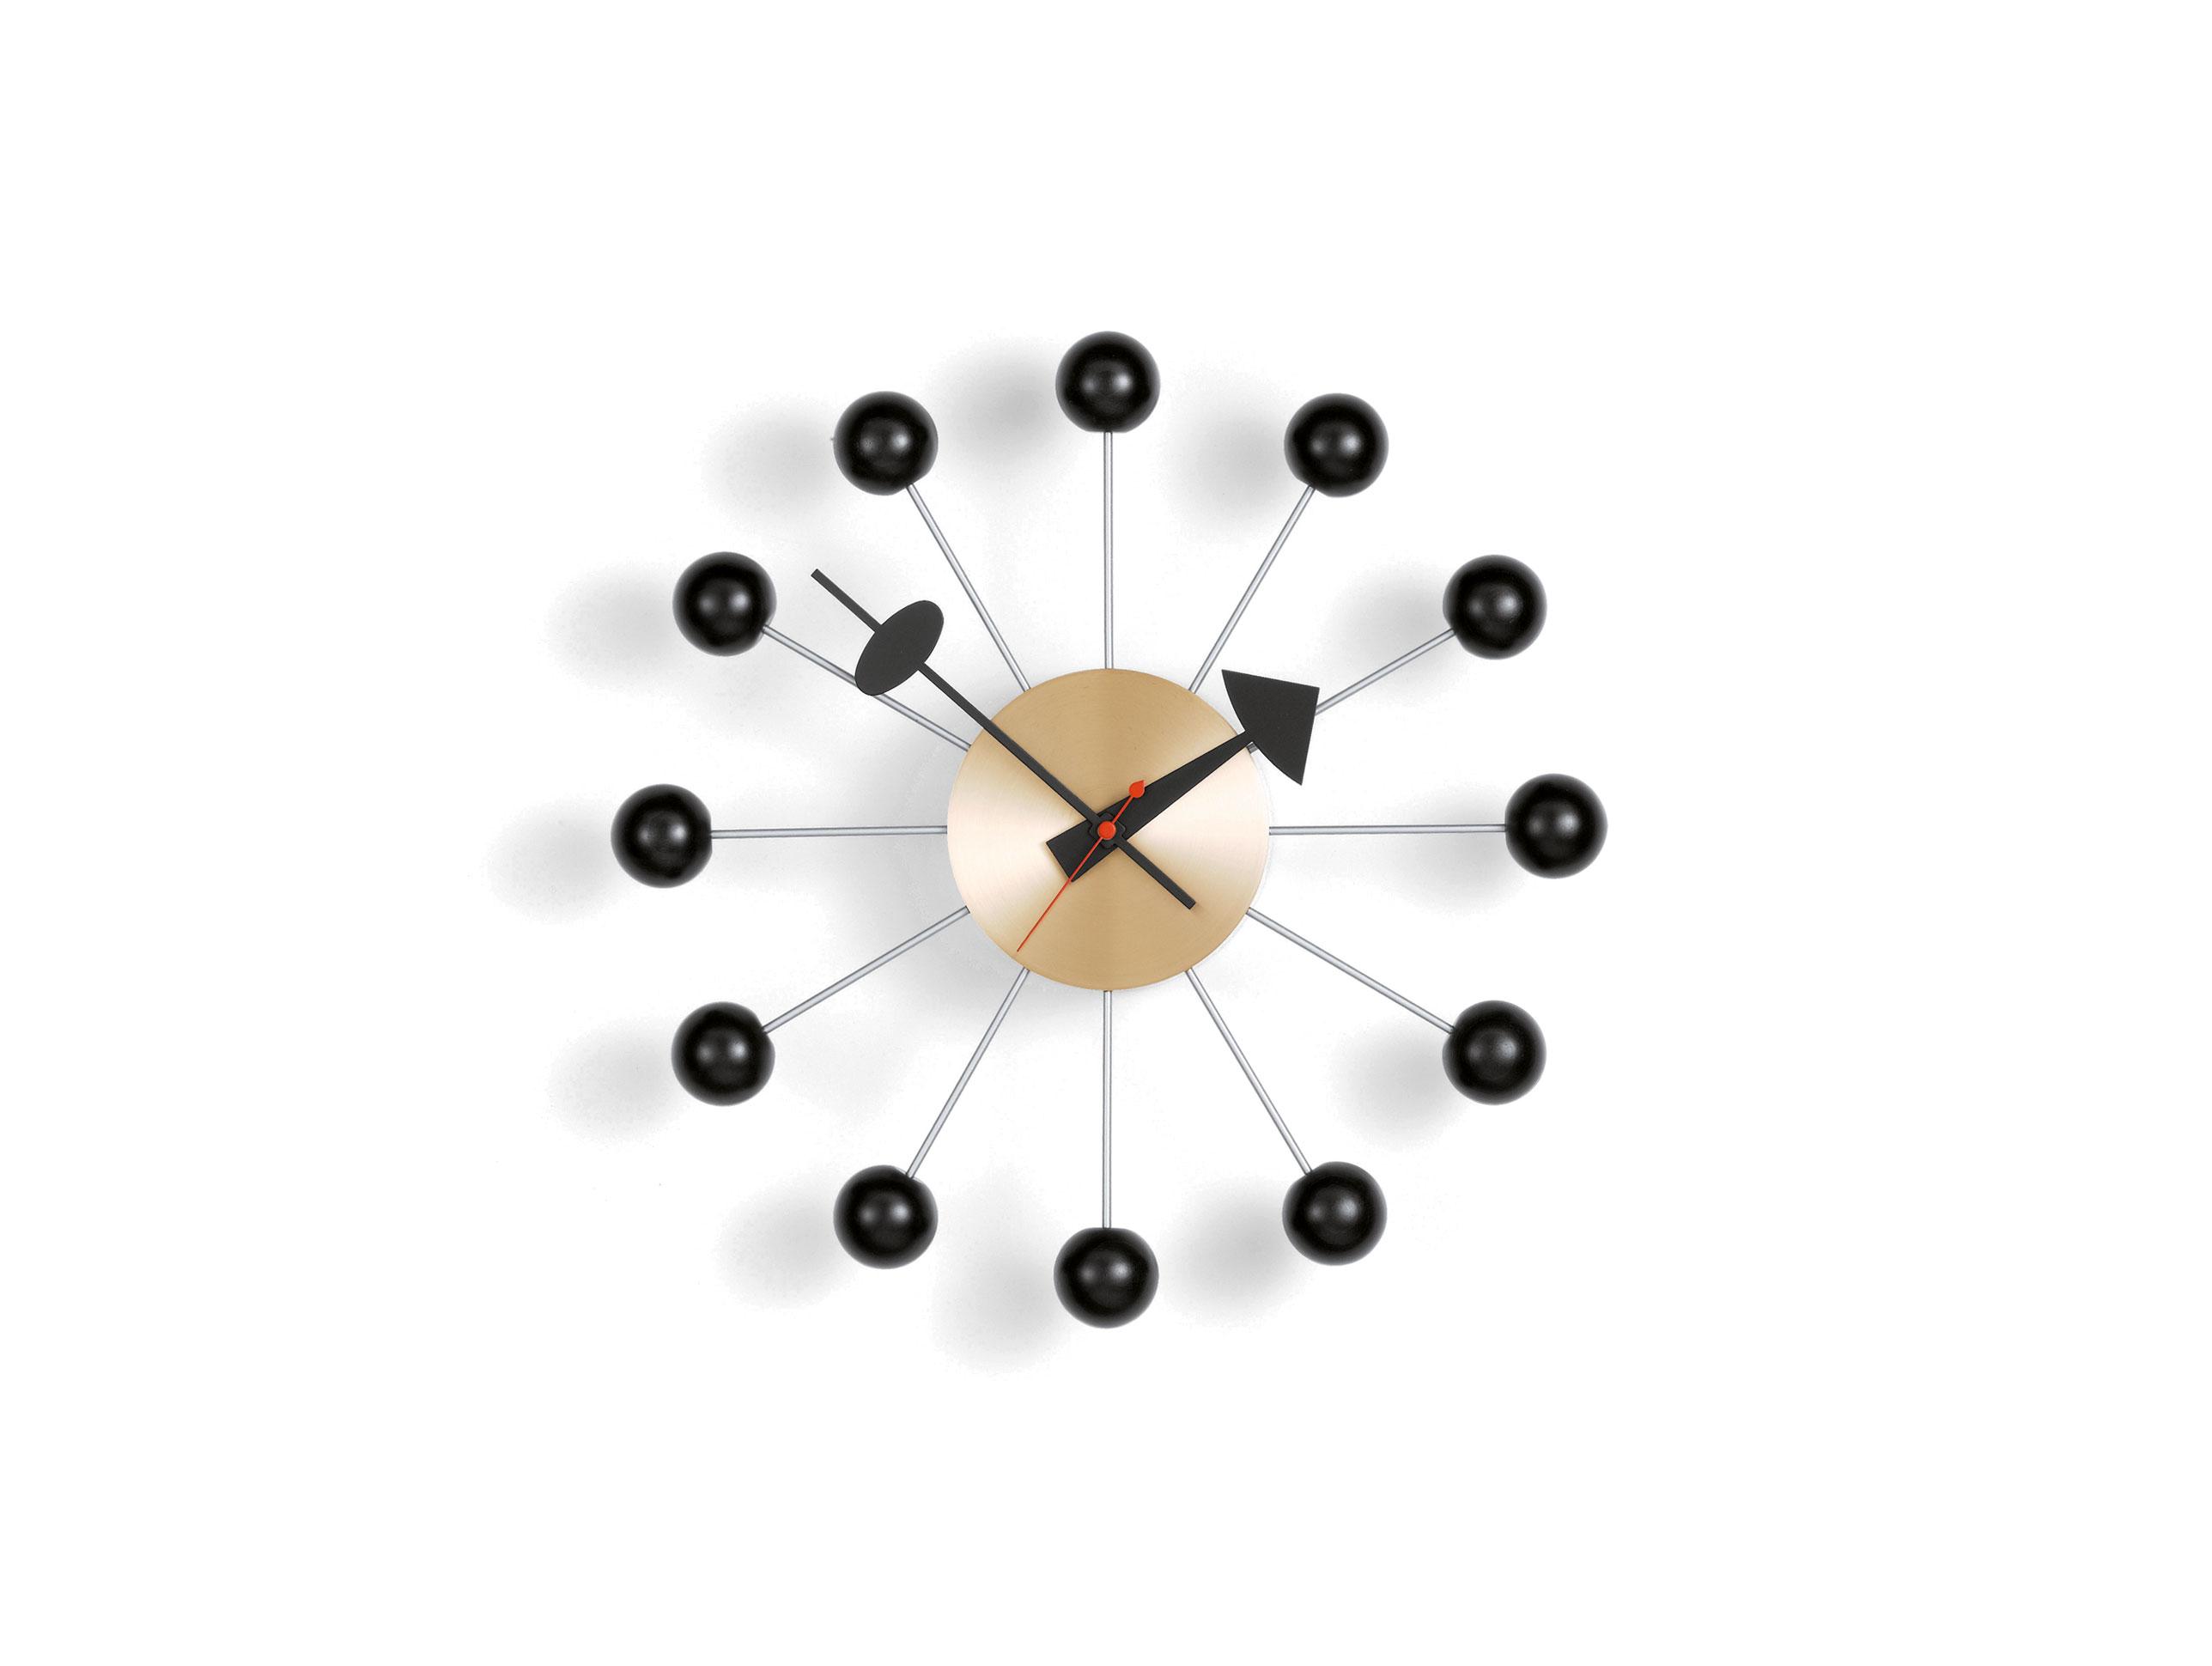 Horloge vitra ball wall clocks noir laiton for Horloge eames